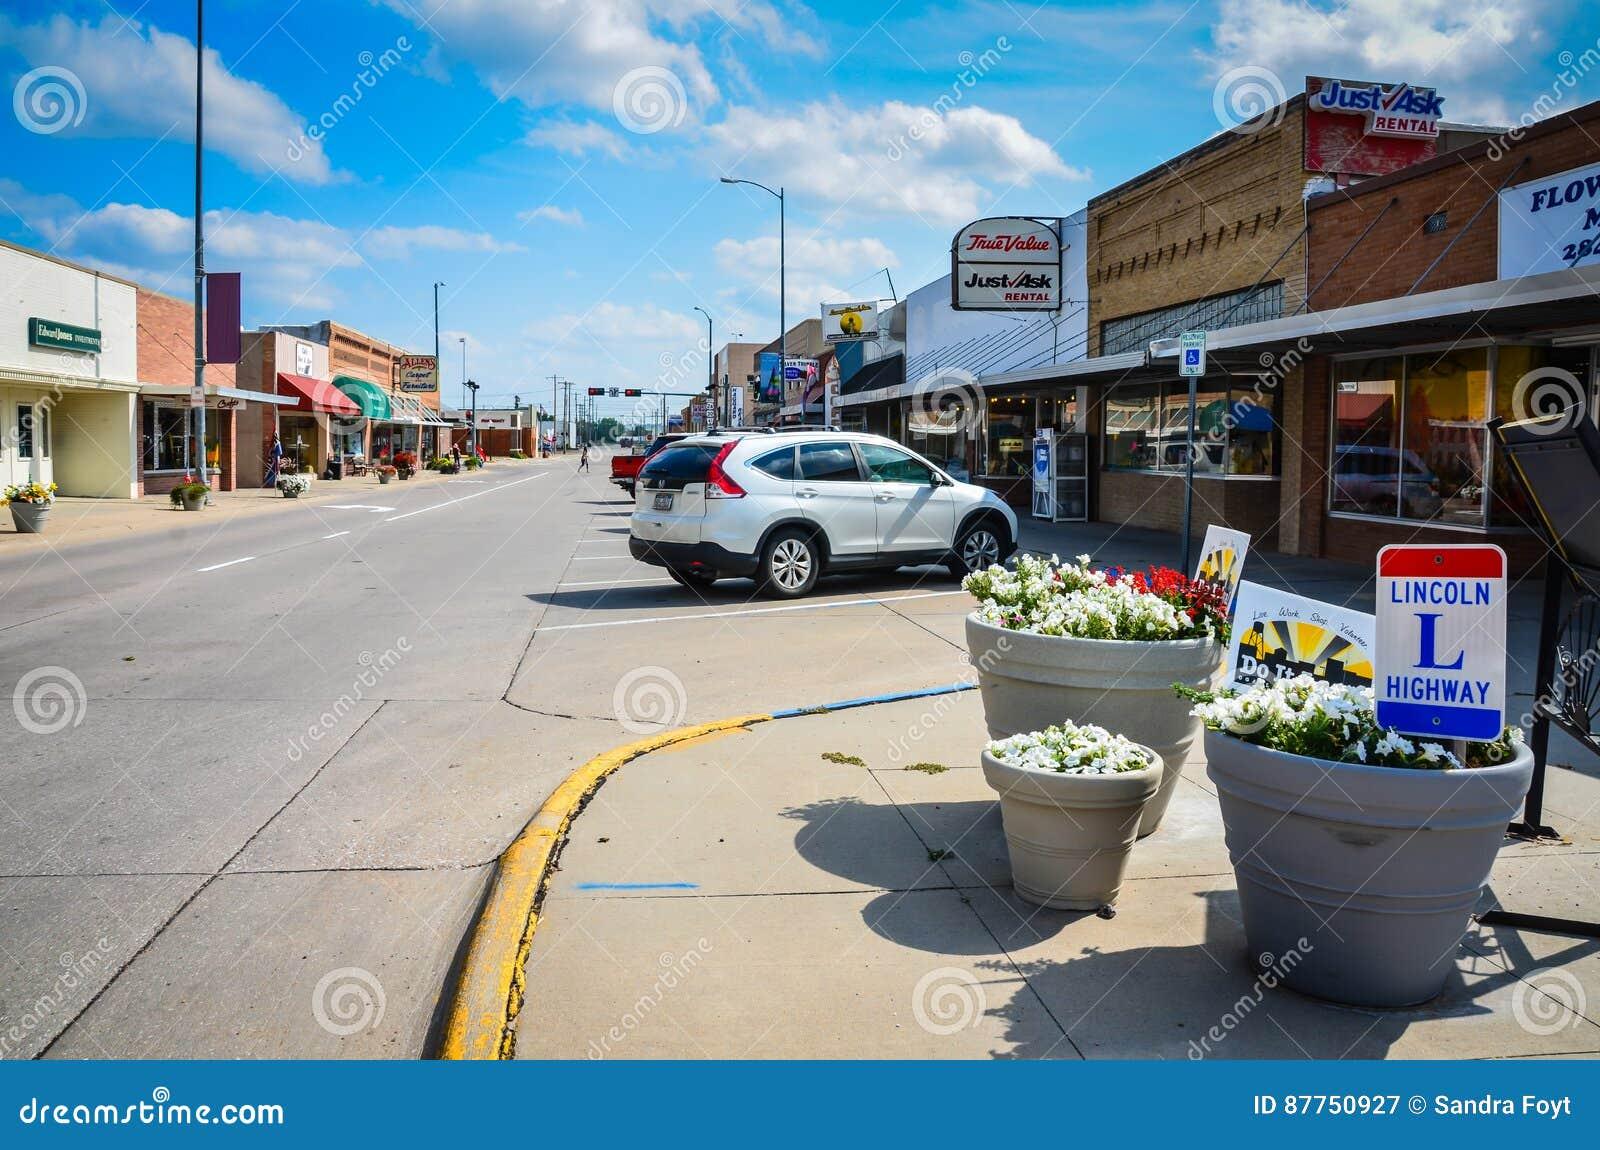 lincoln highway ogallala nebraska editorial photography image 87750927. Black Bedroom Furniture Sets. Home Design Ideas